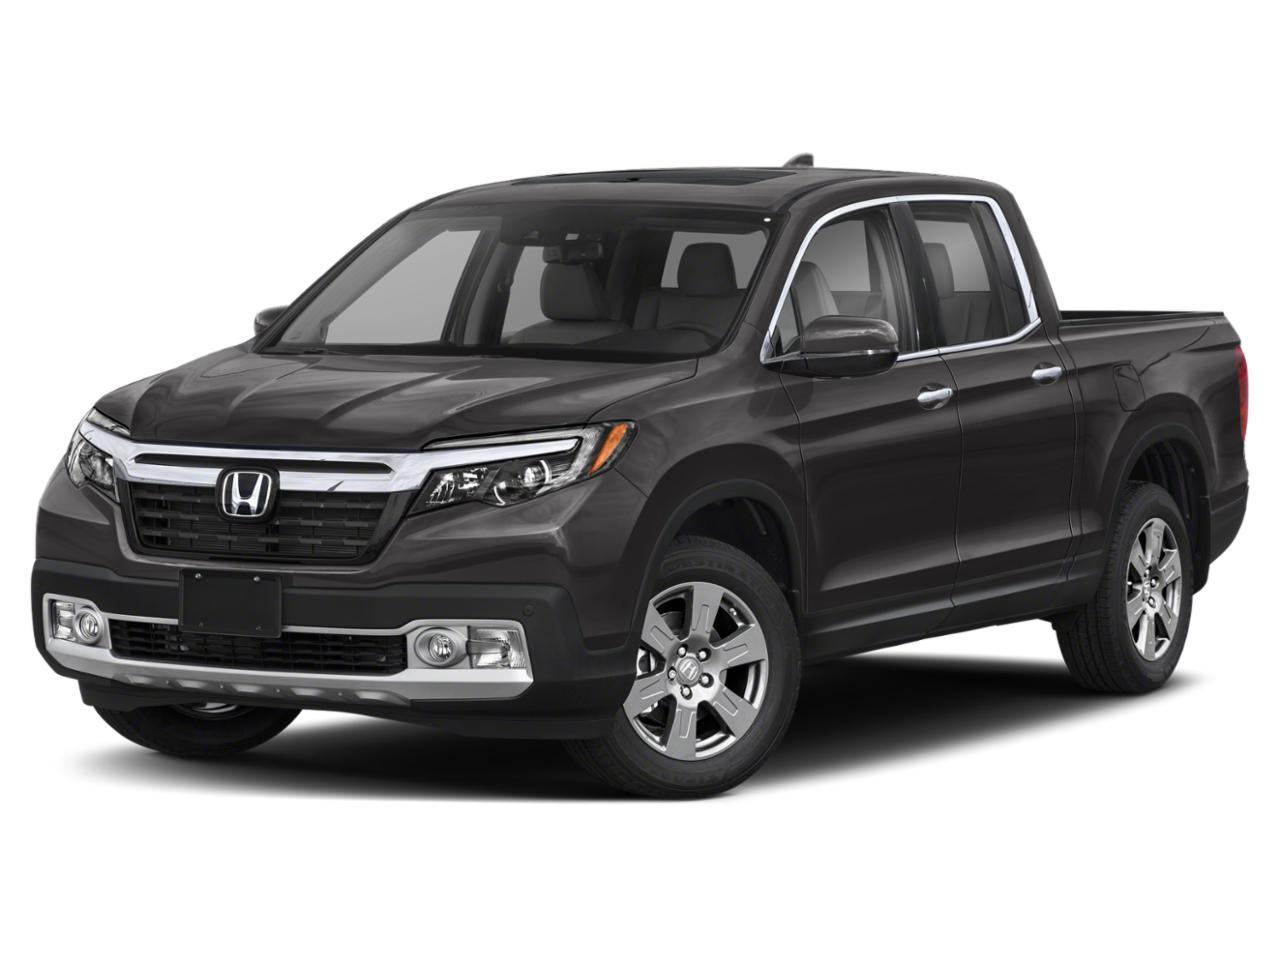 2020 Honda Ridgeline Vehicle Photo in San Antonio, TX 78238